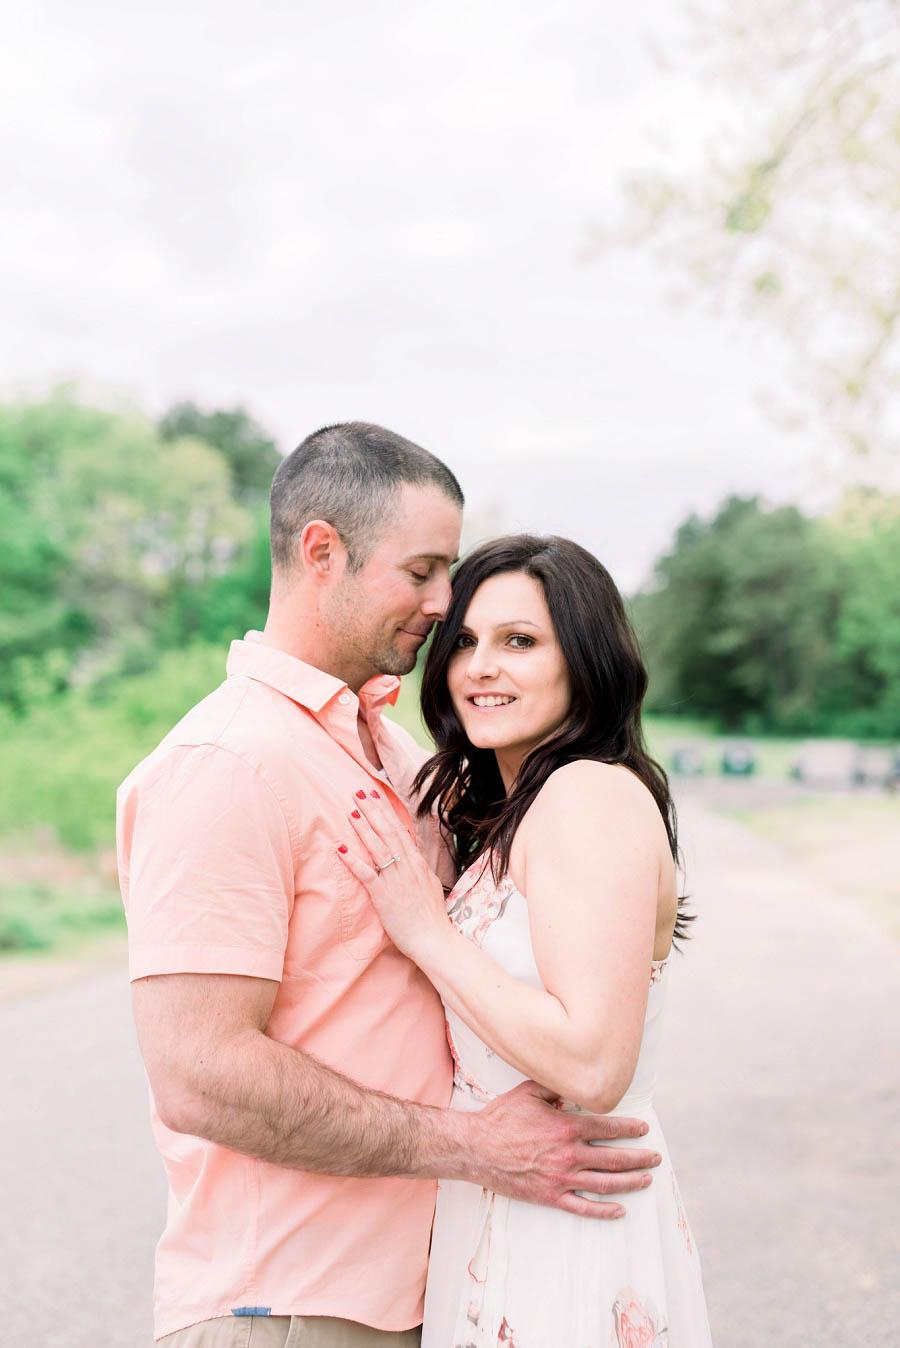 Spring Engagement - NJ Wedding Photographer - Myra Roman Photography-2.jpg